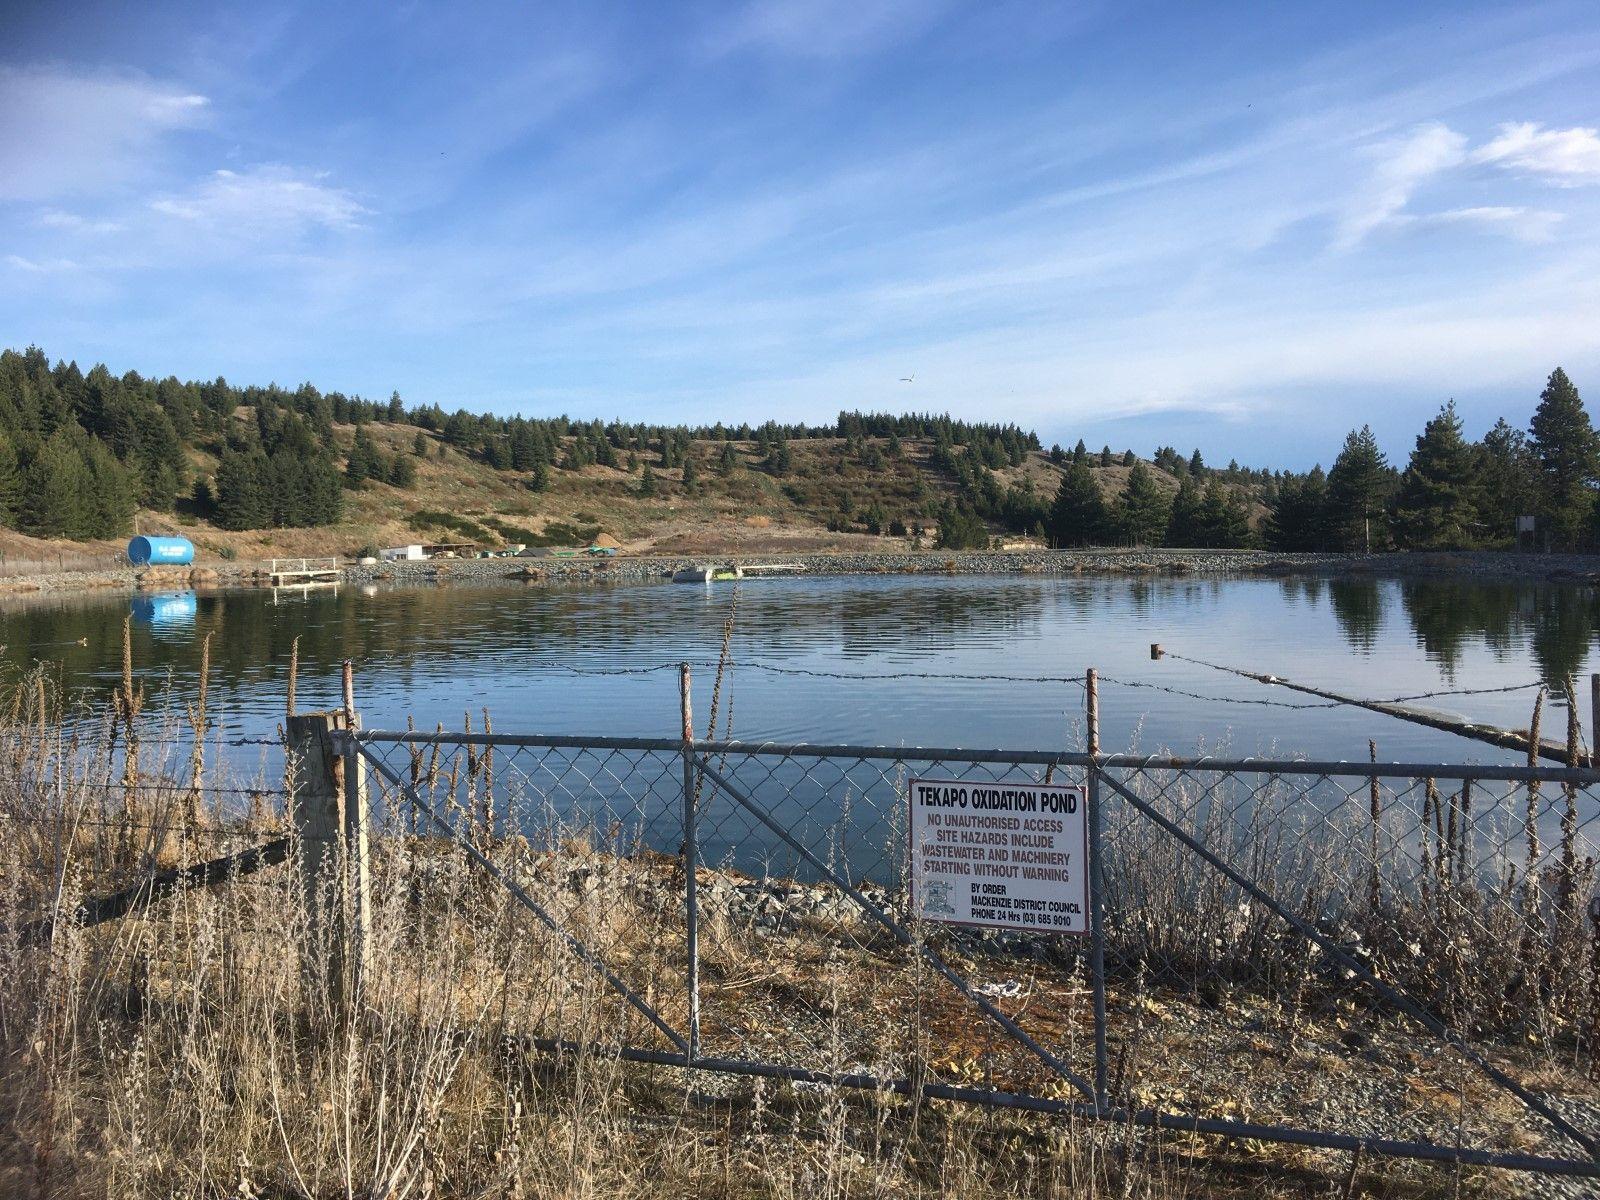 Tekapo Water Oxidation Pond banner image